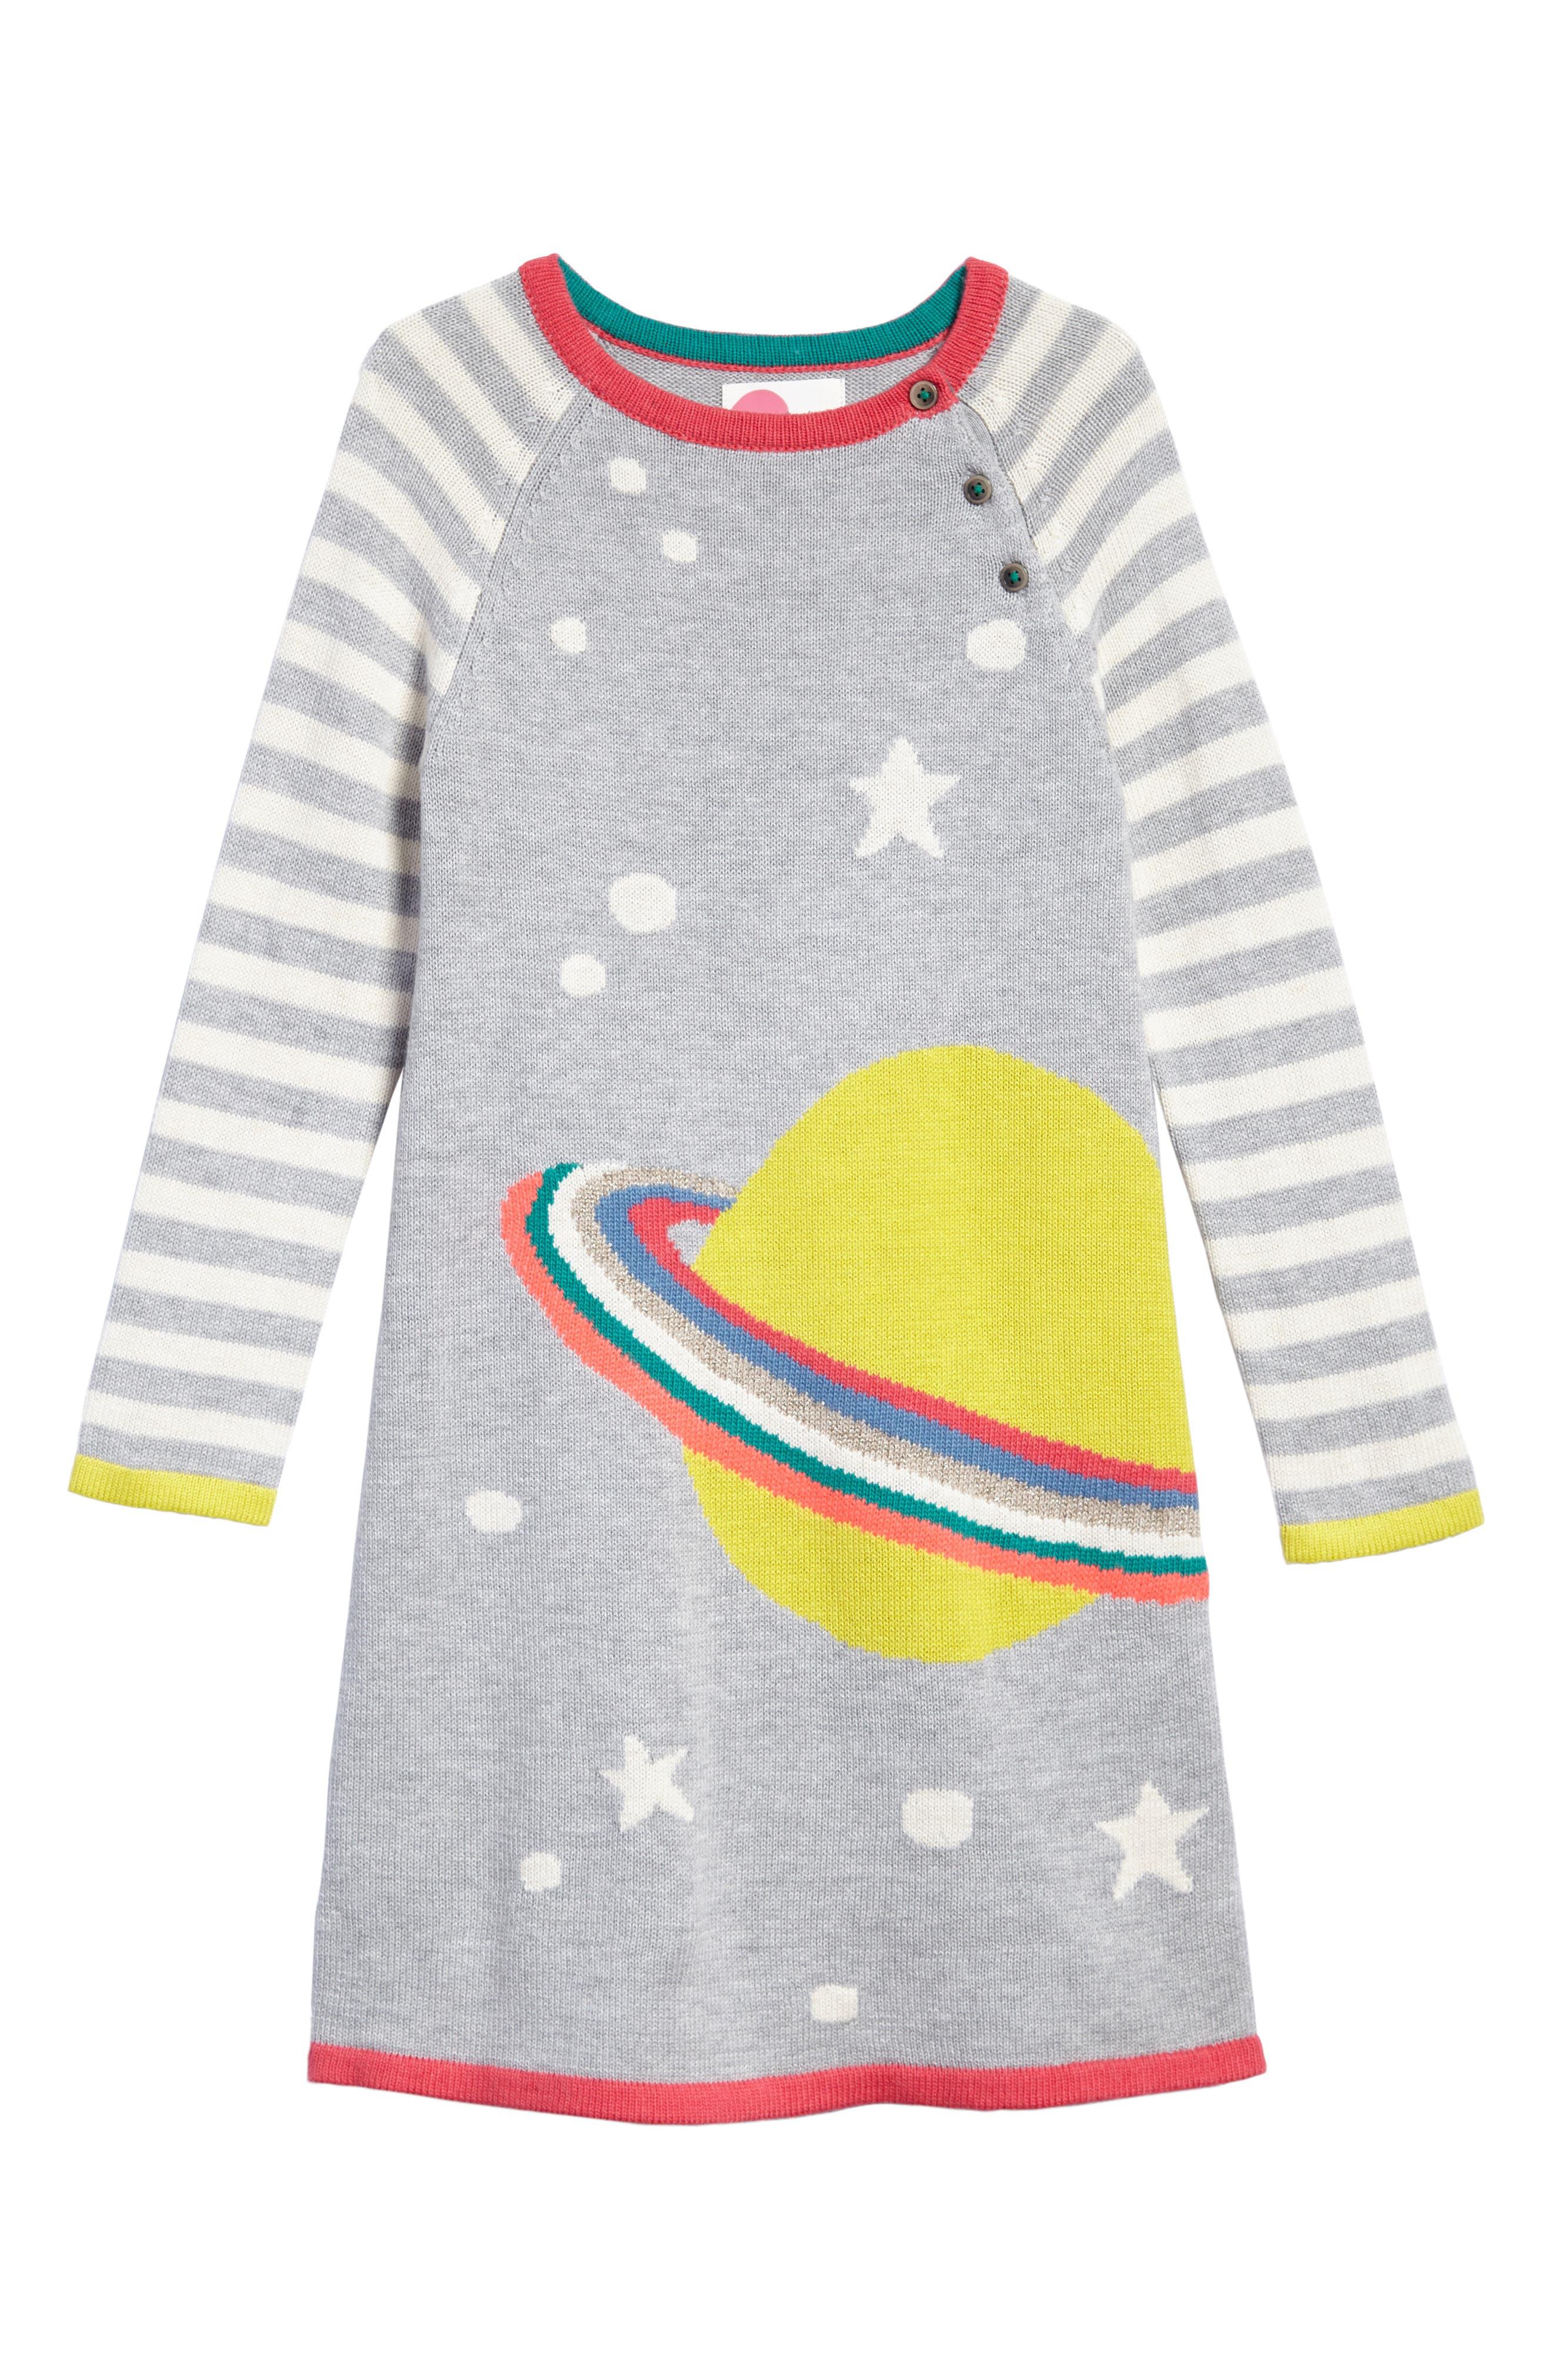 Main Image - Mini Boden Fun Knit Dress (Toddler Girls, Little Girls & Big Girls)